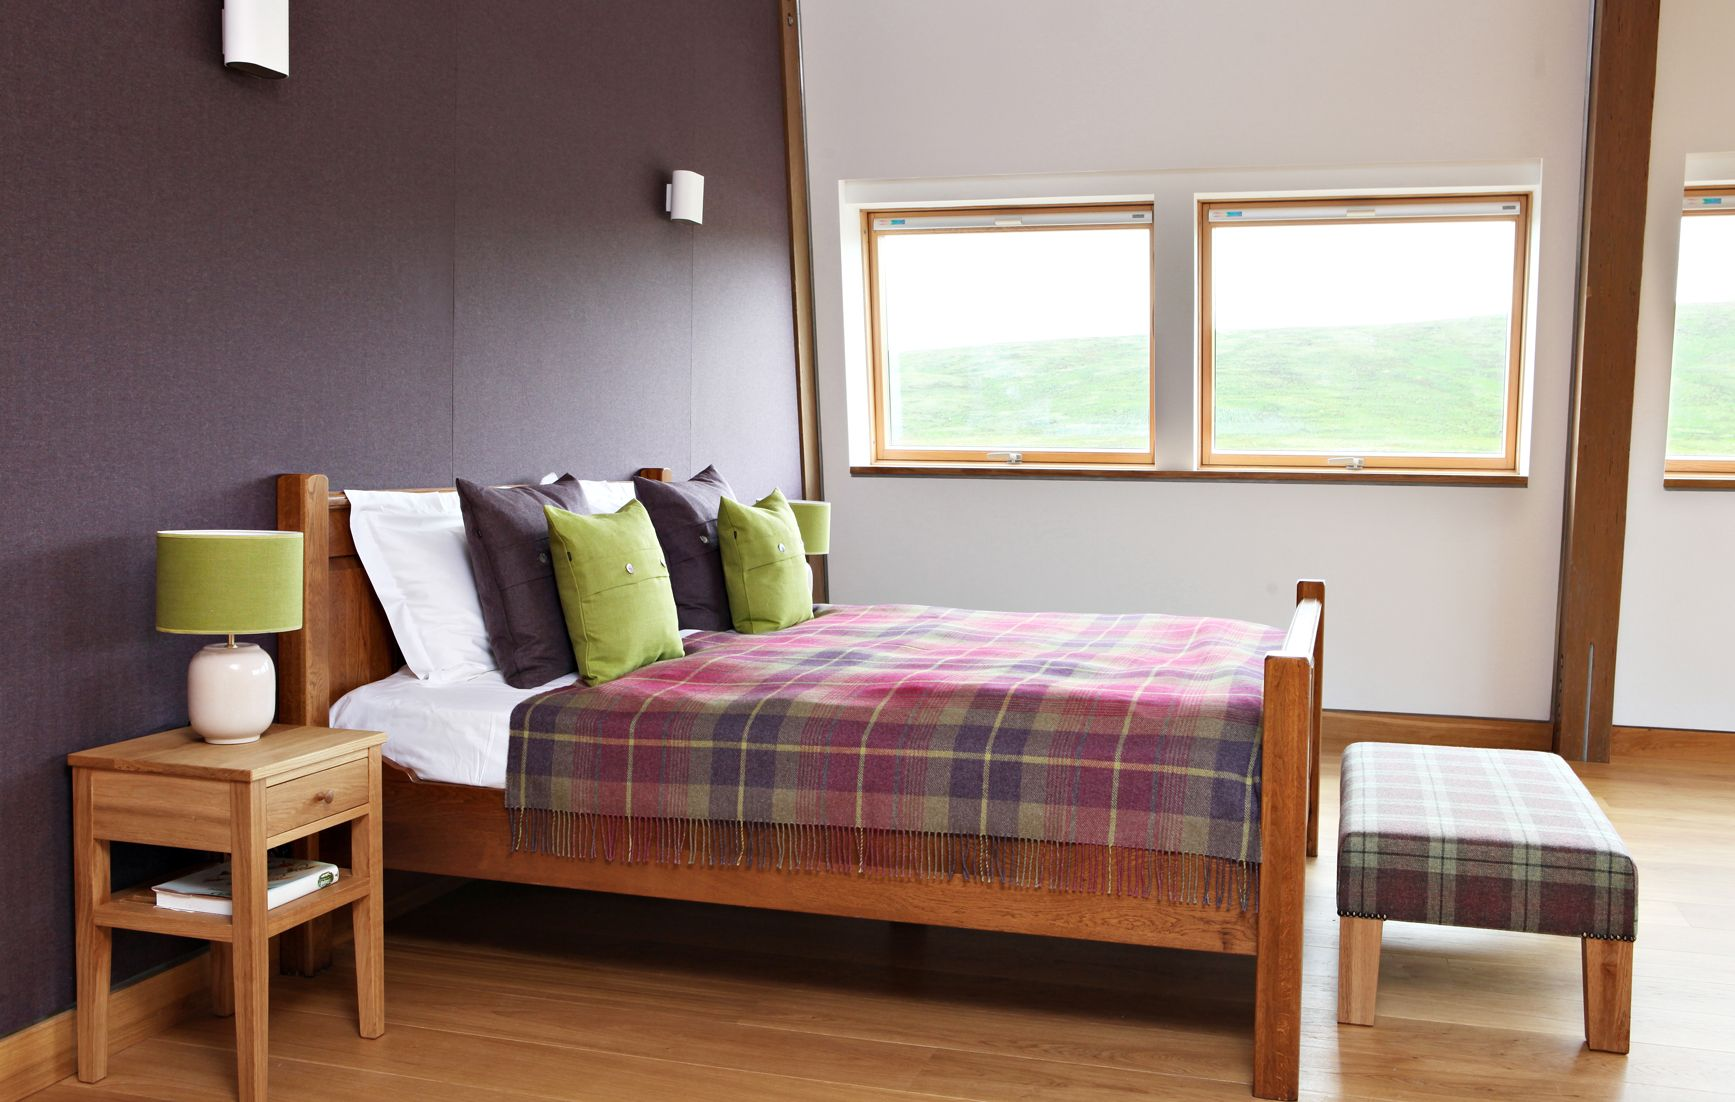 For more gorgeous interior design inspiration visit